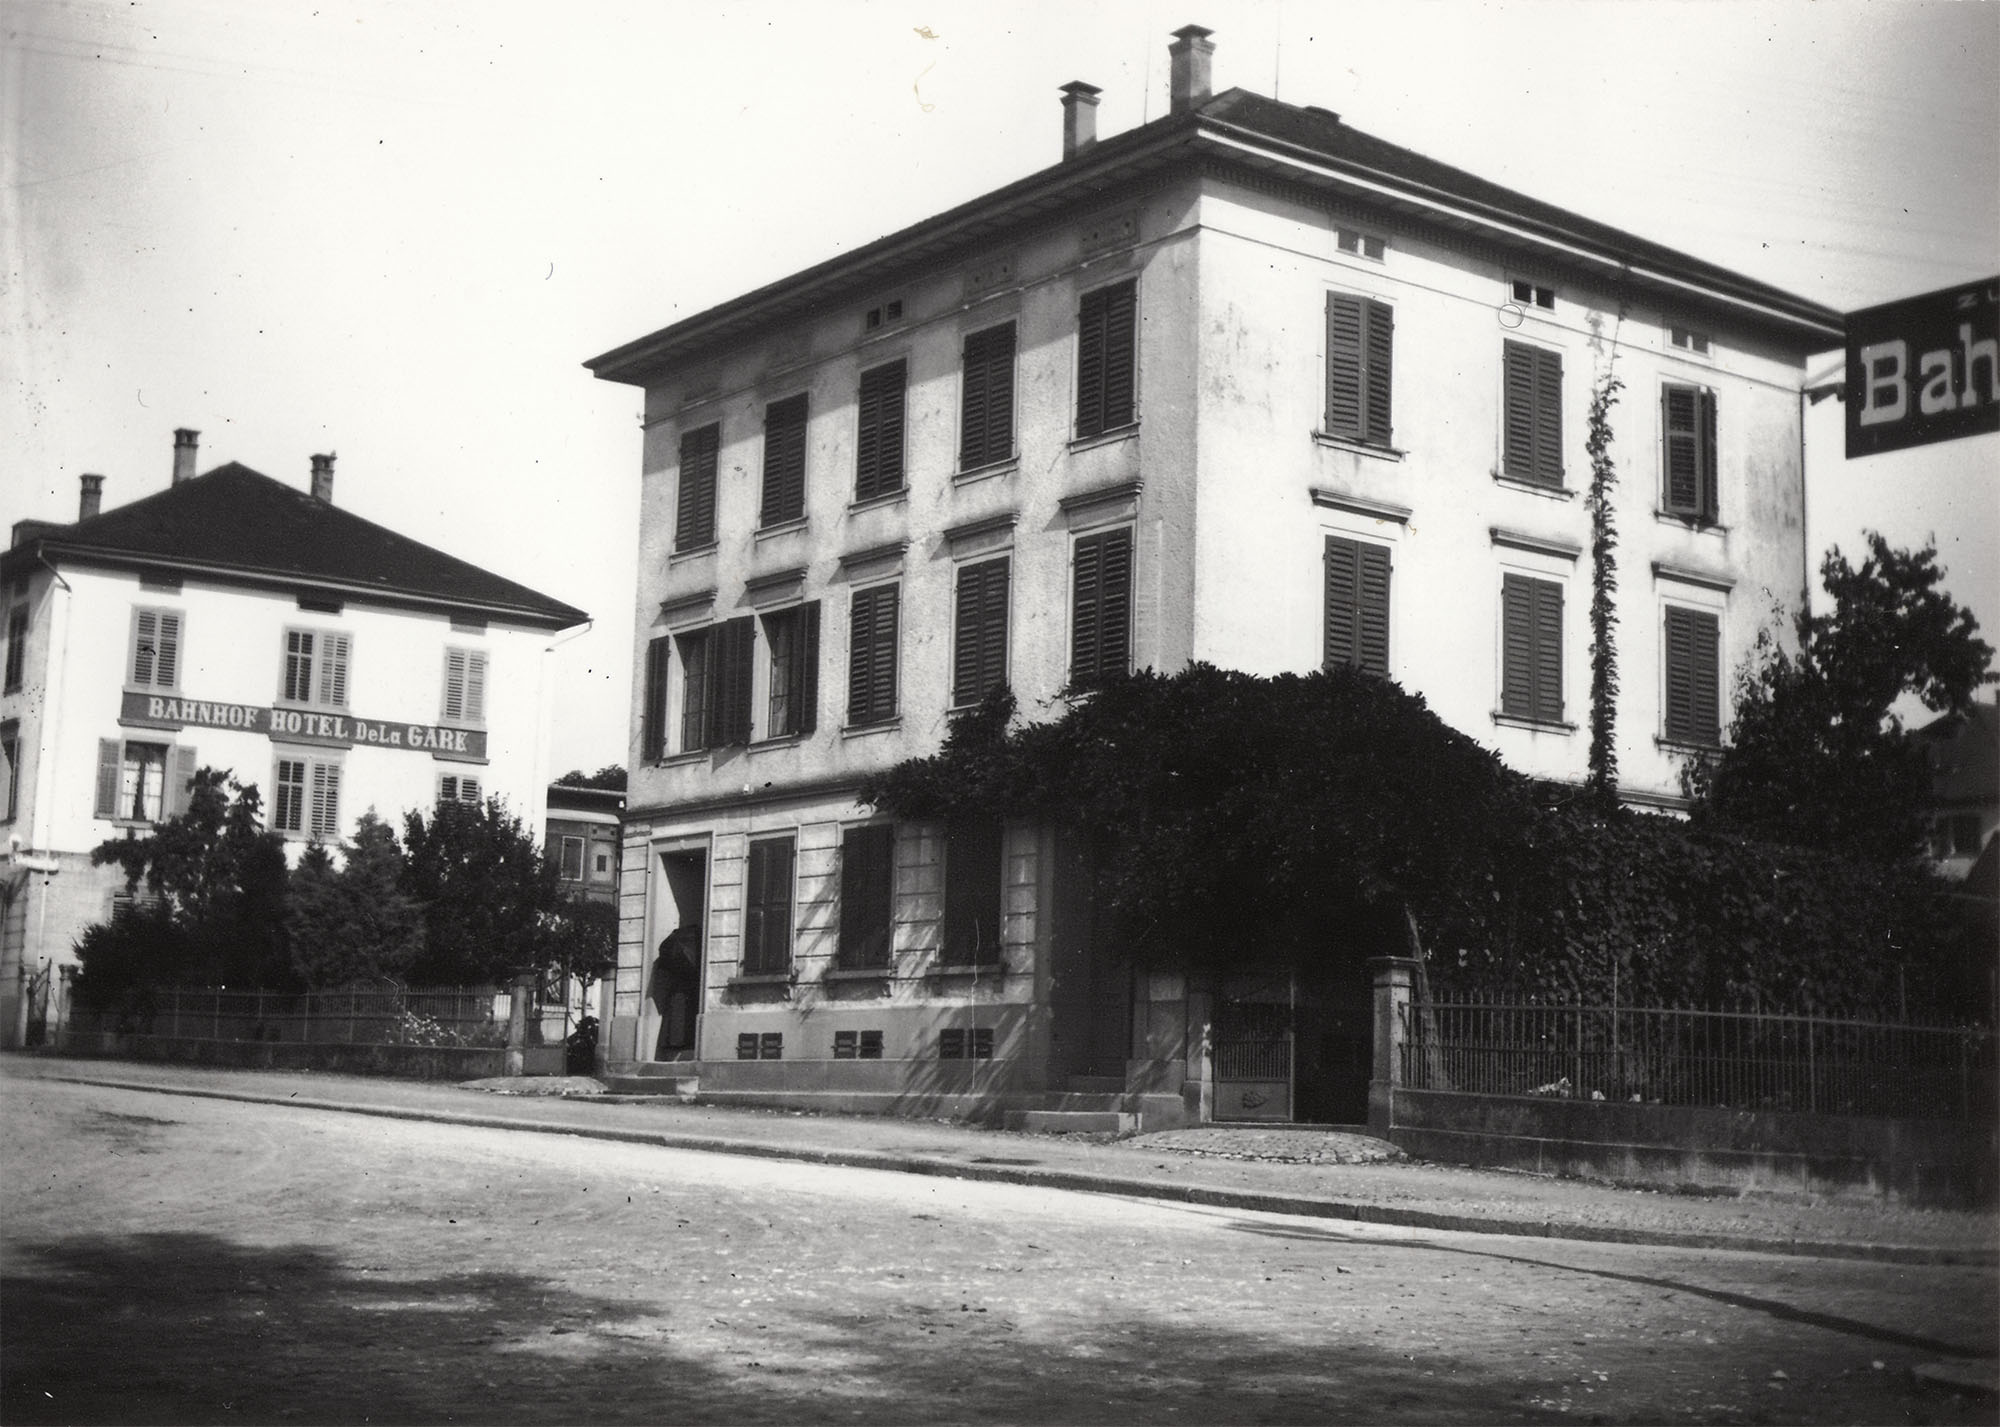 Hotel Bahnhof Zug